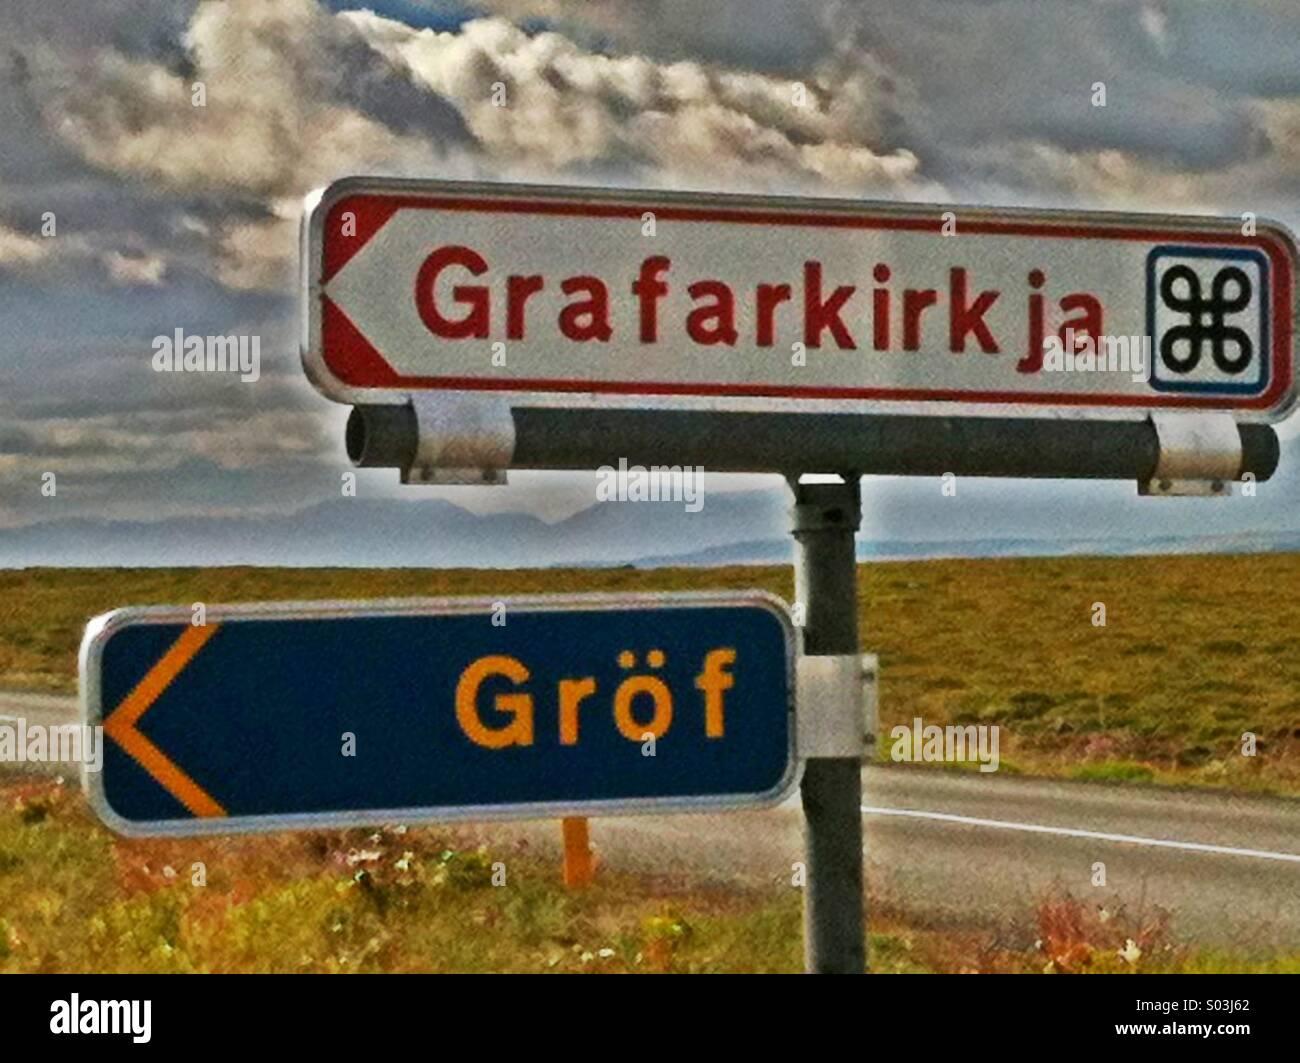 Road signs pointing to Grafarkirkja church near Grof Iceland - Stock Image